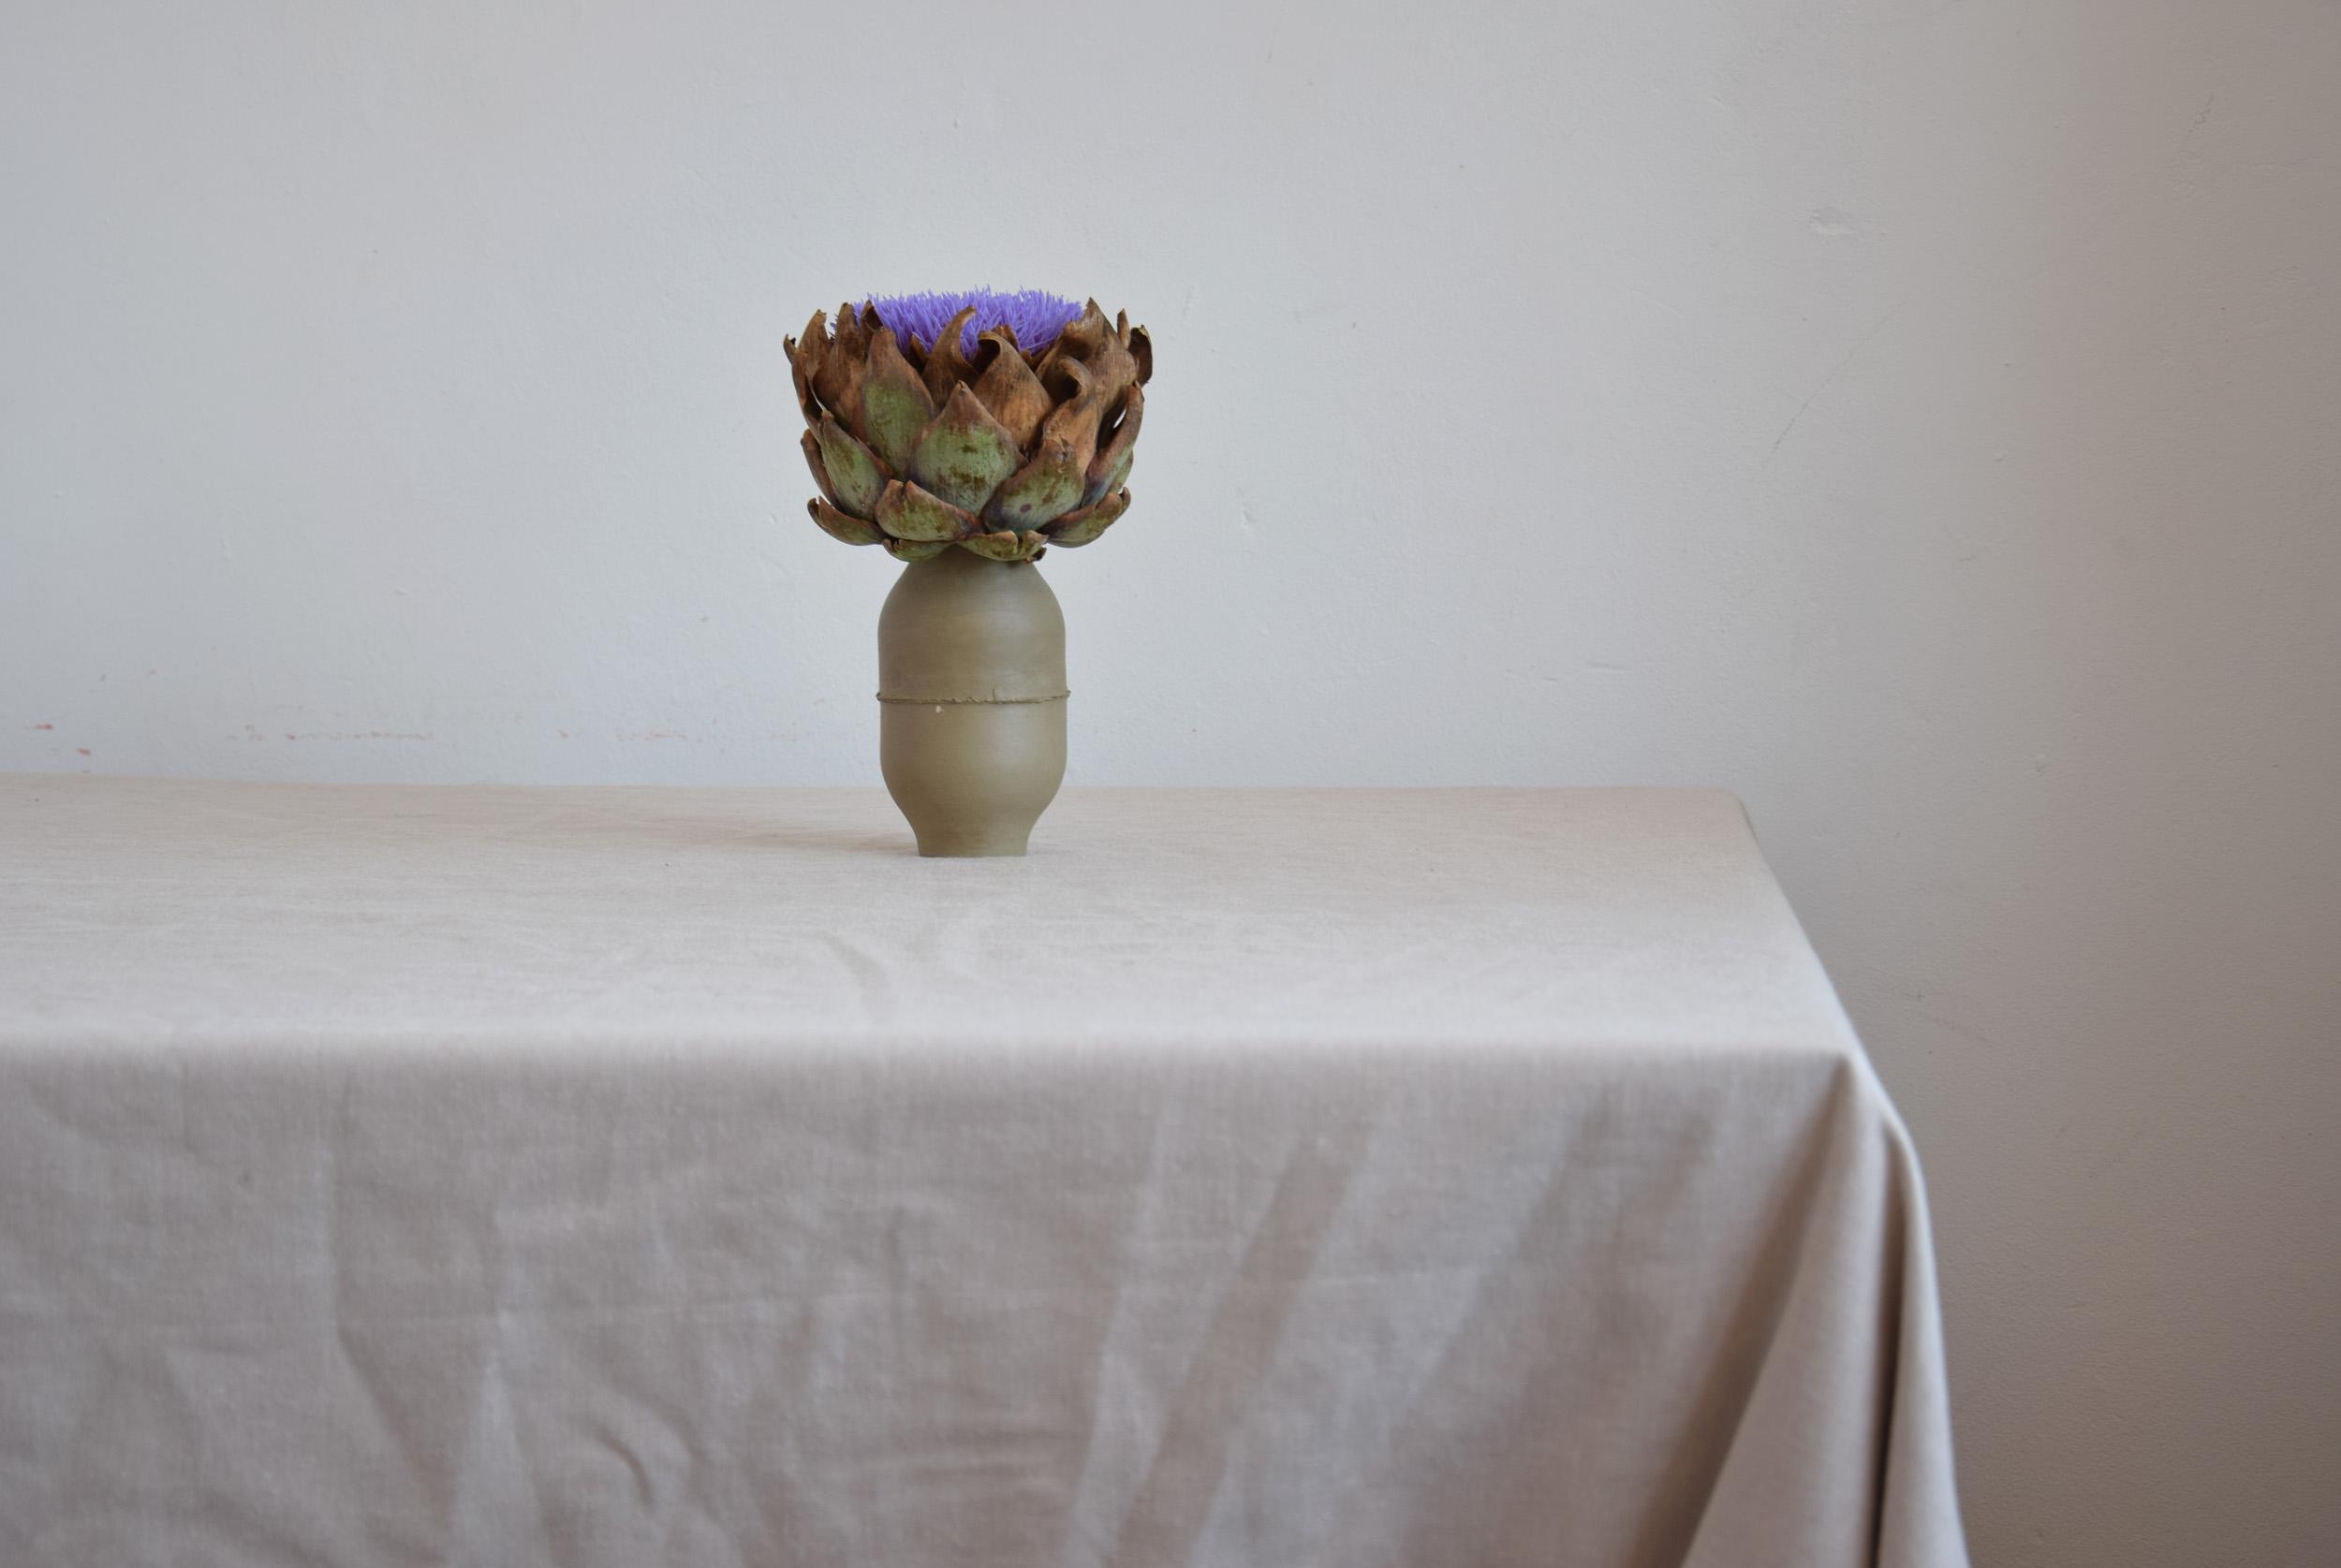 artichoke-studiokryszewski.jpg